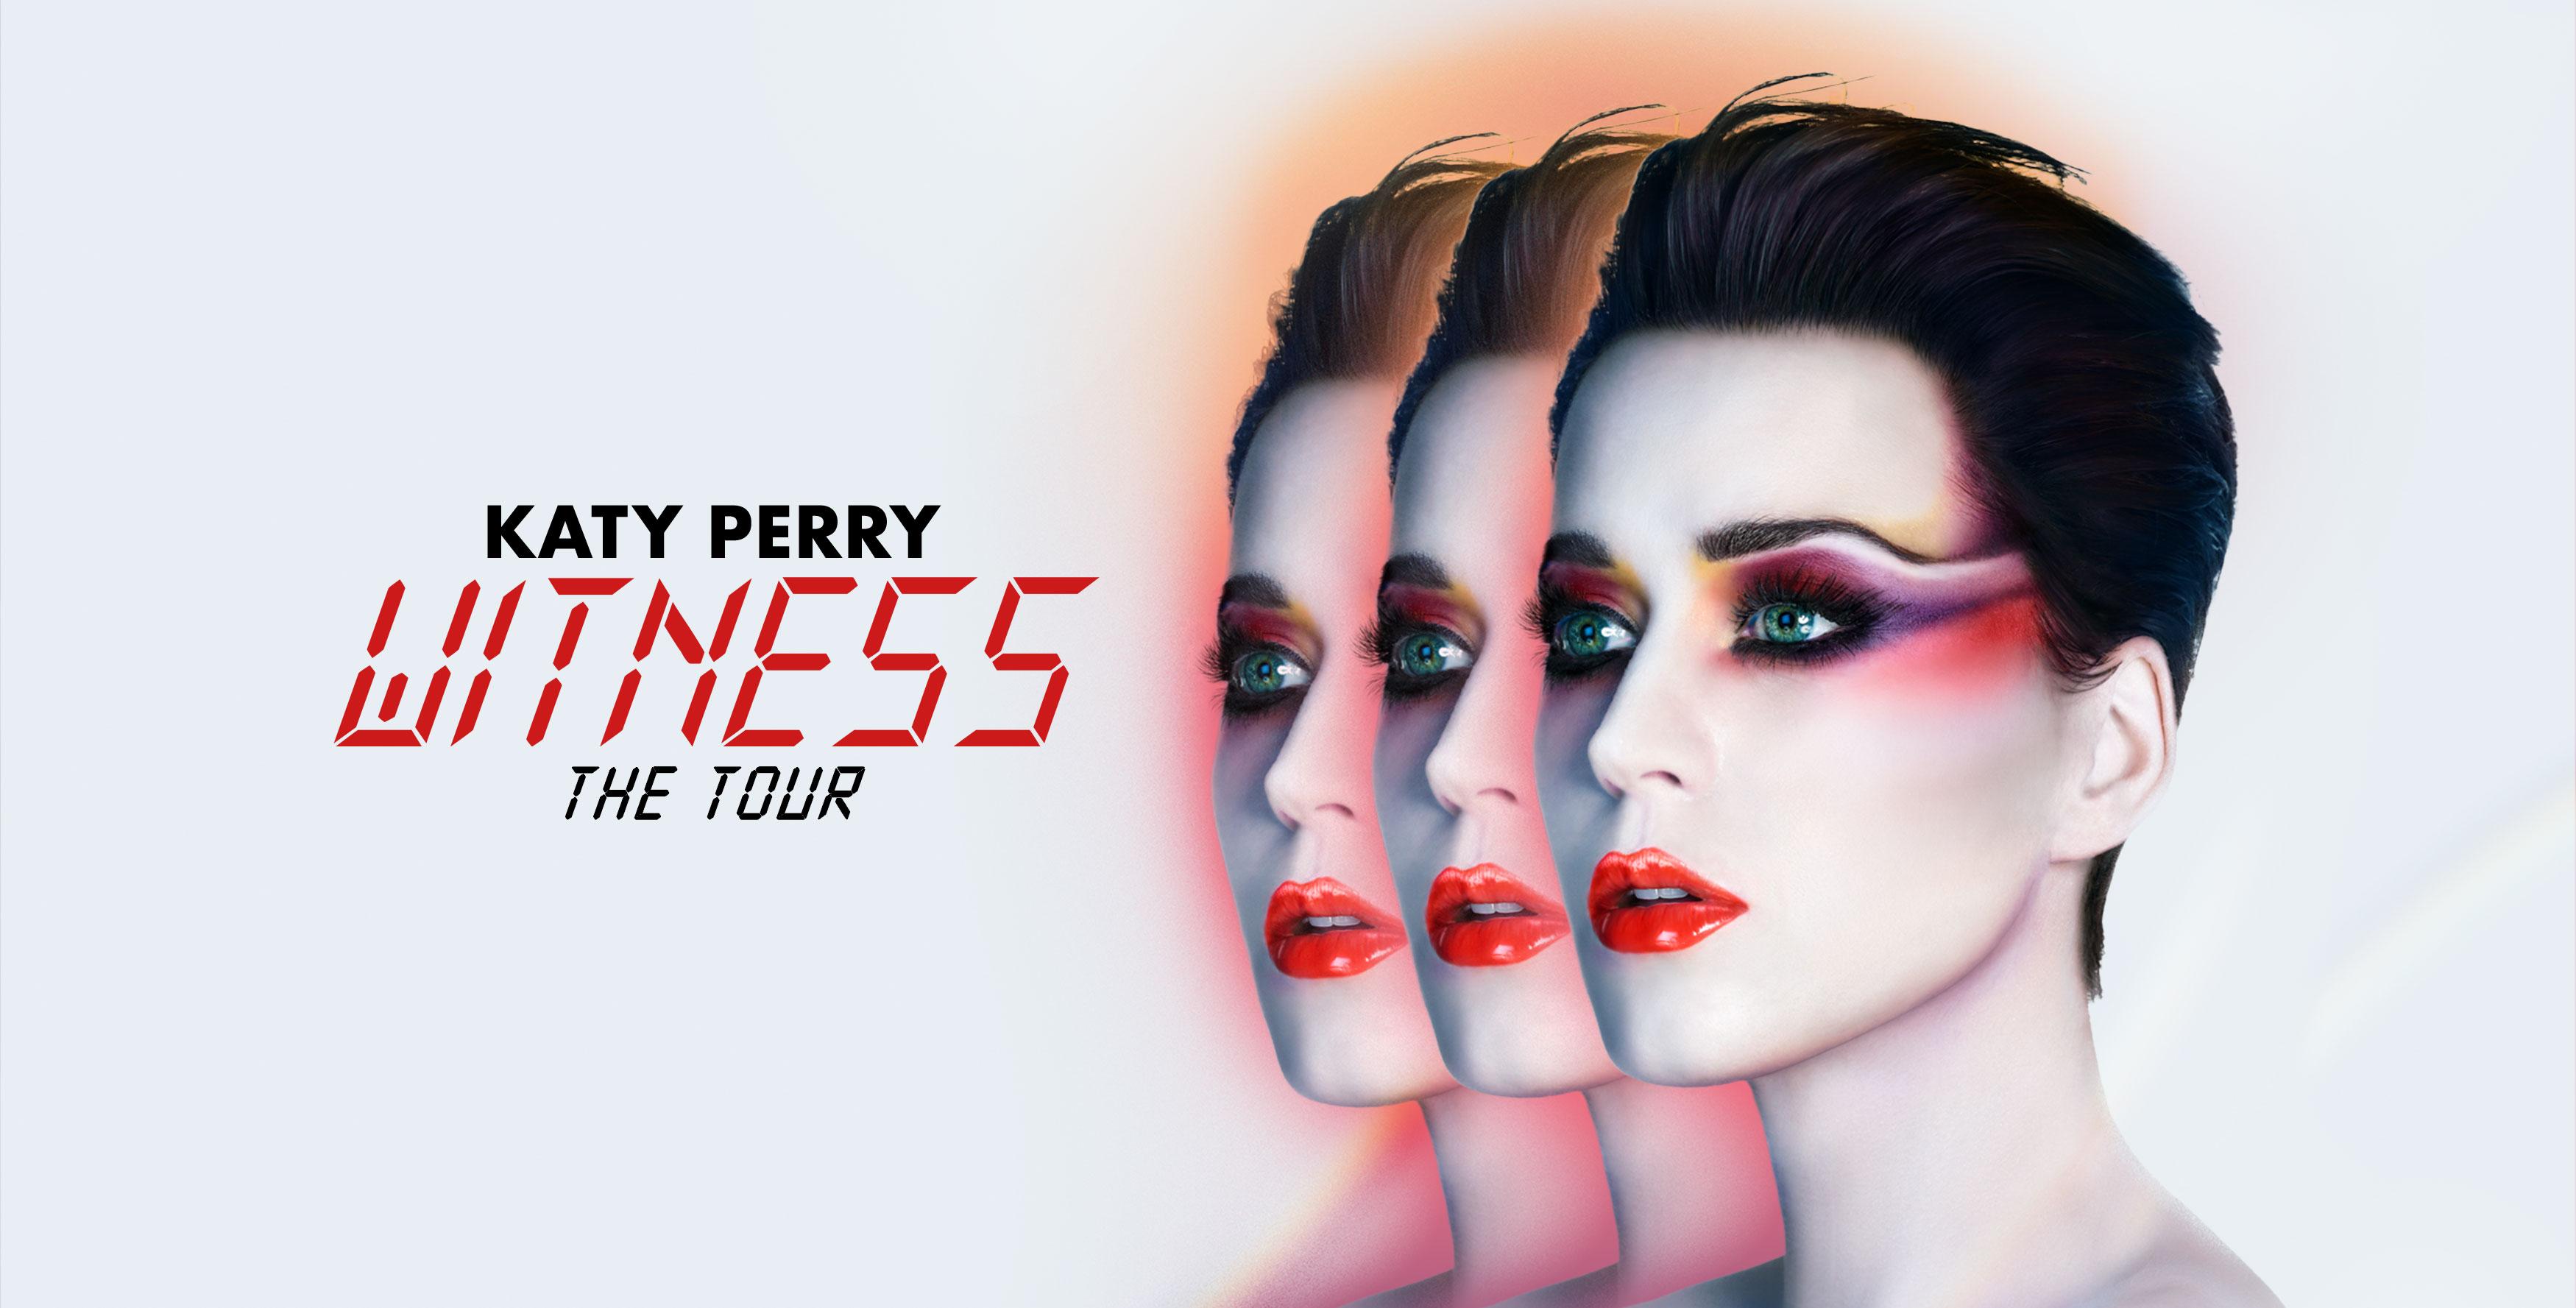 Mau Tiket Gratis Konser Katy Perry? Cek di Sini